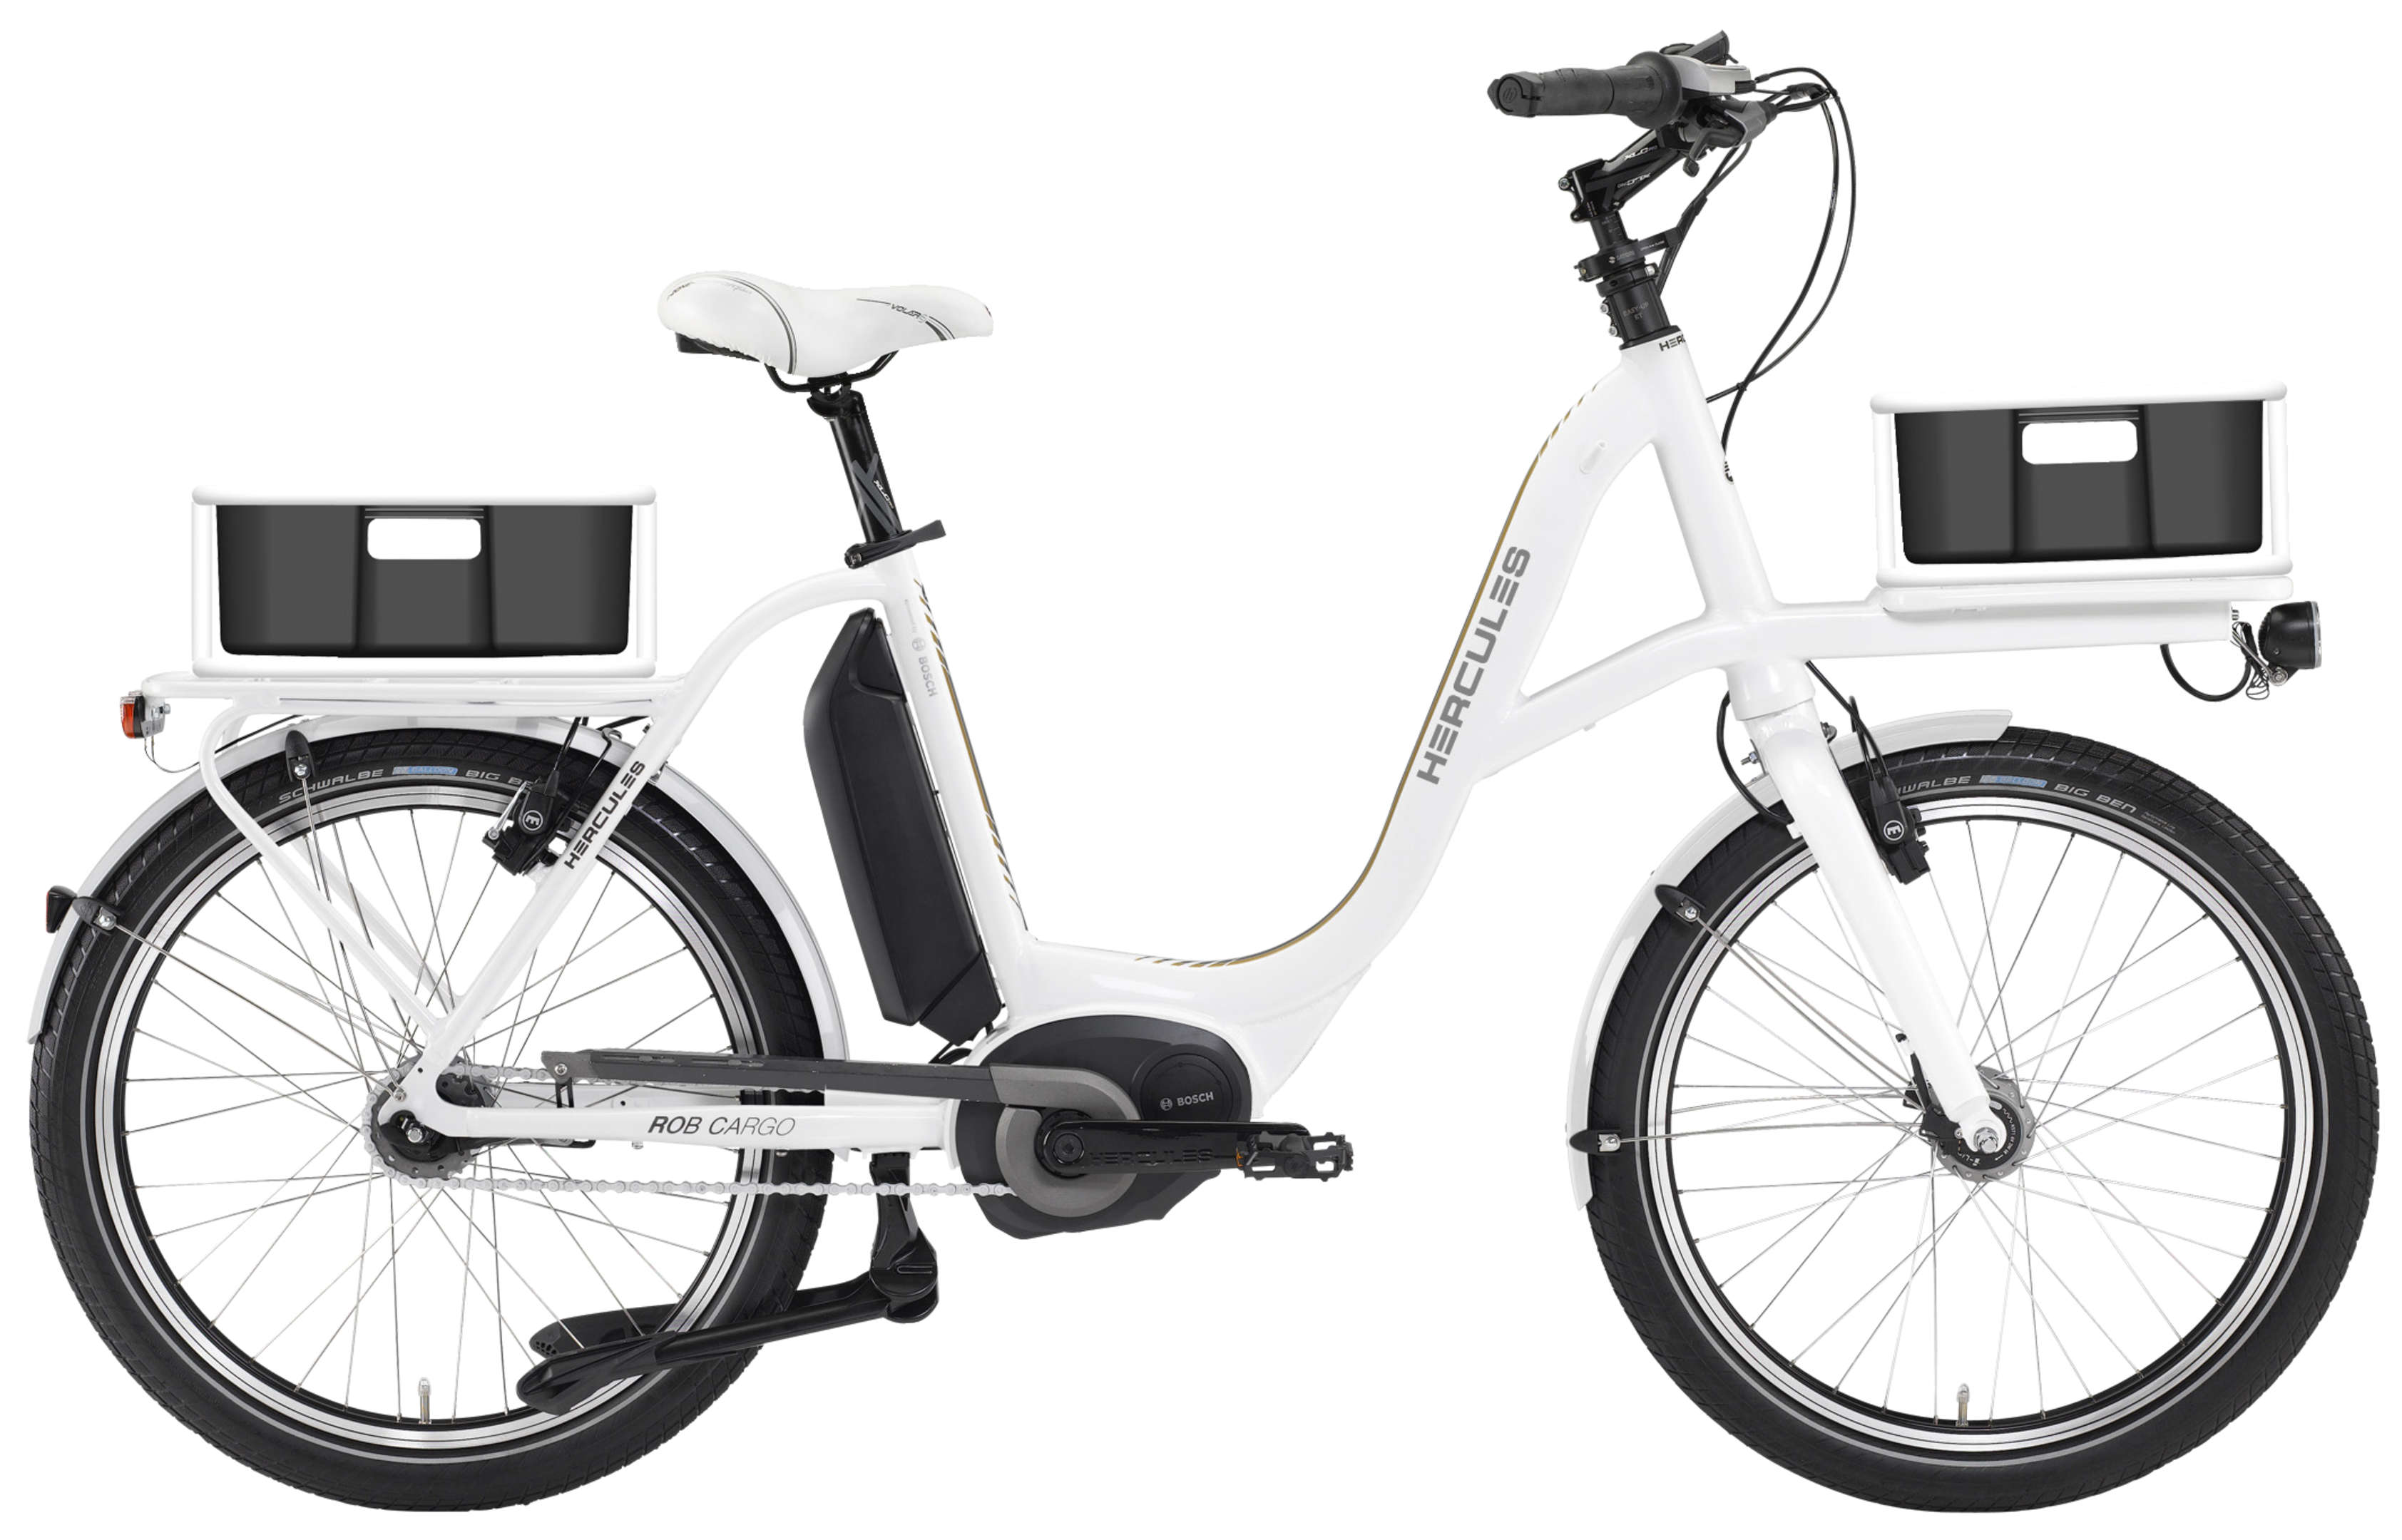 hercules e bike rob cargo eurorad bikeleasingeurorad. Black Bedroom Furniture Sets. Home Design Ideas